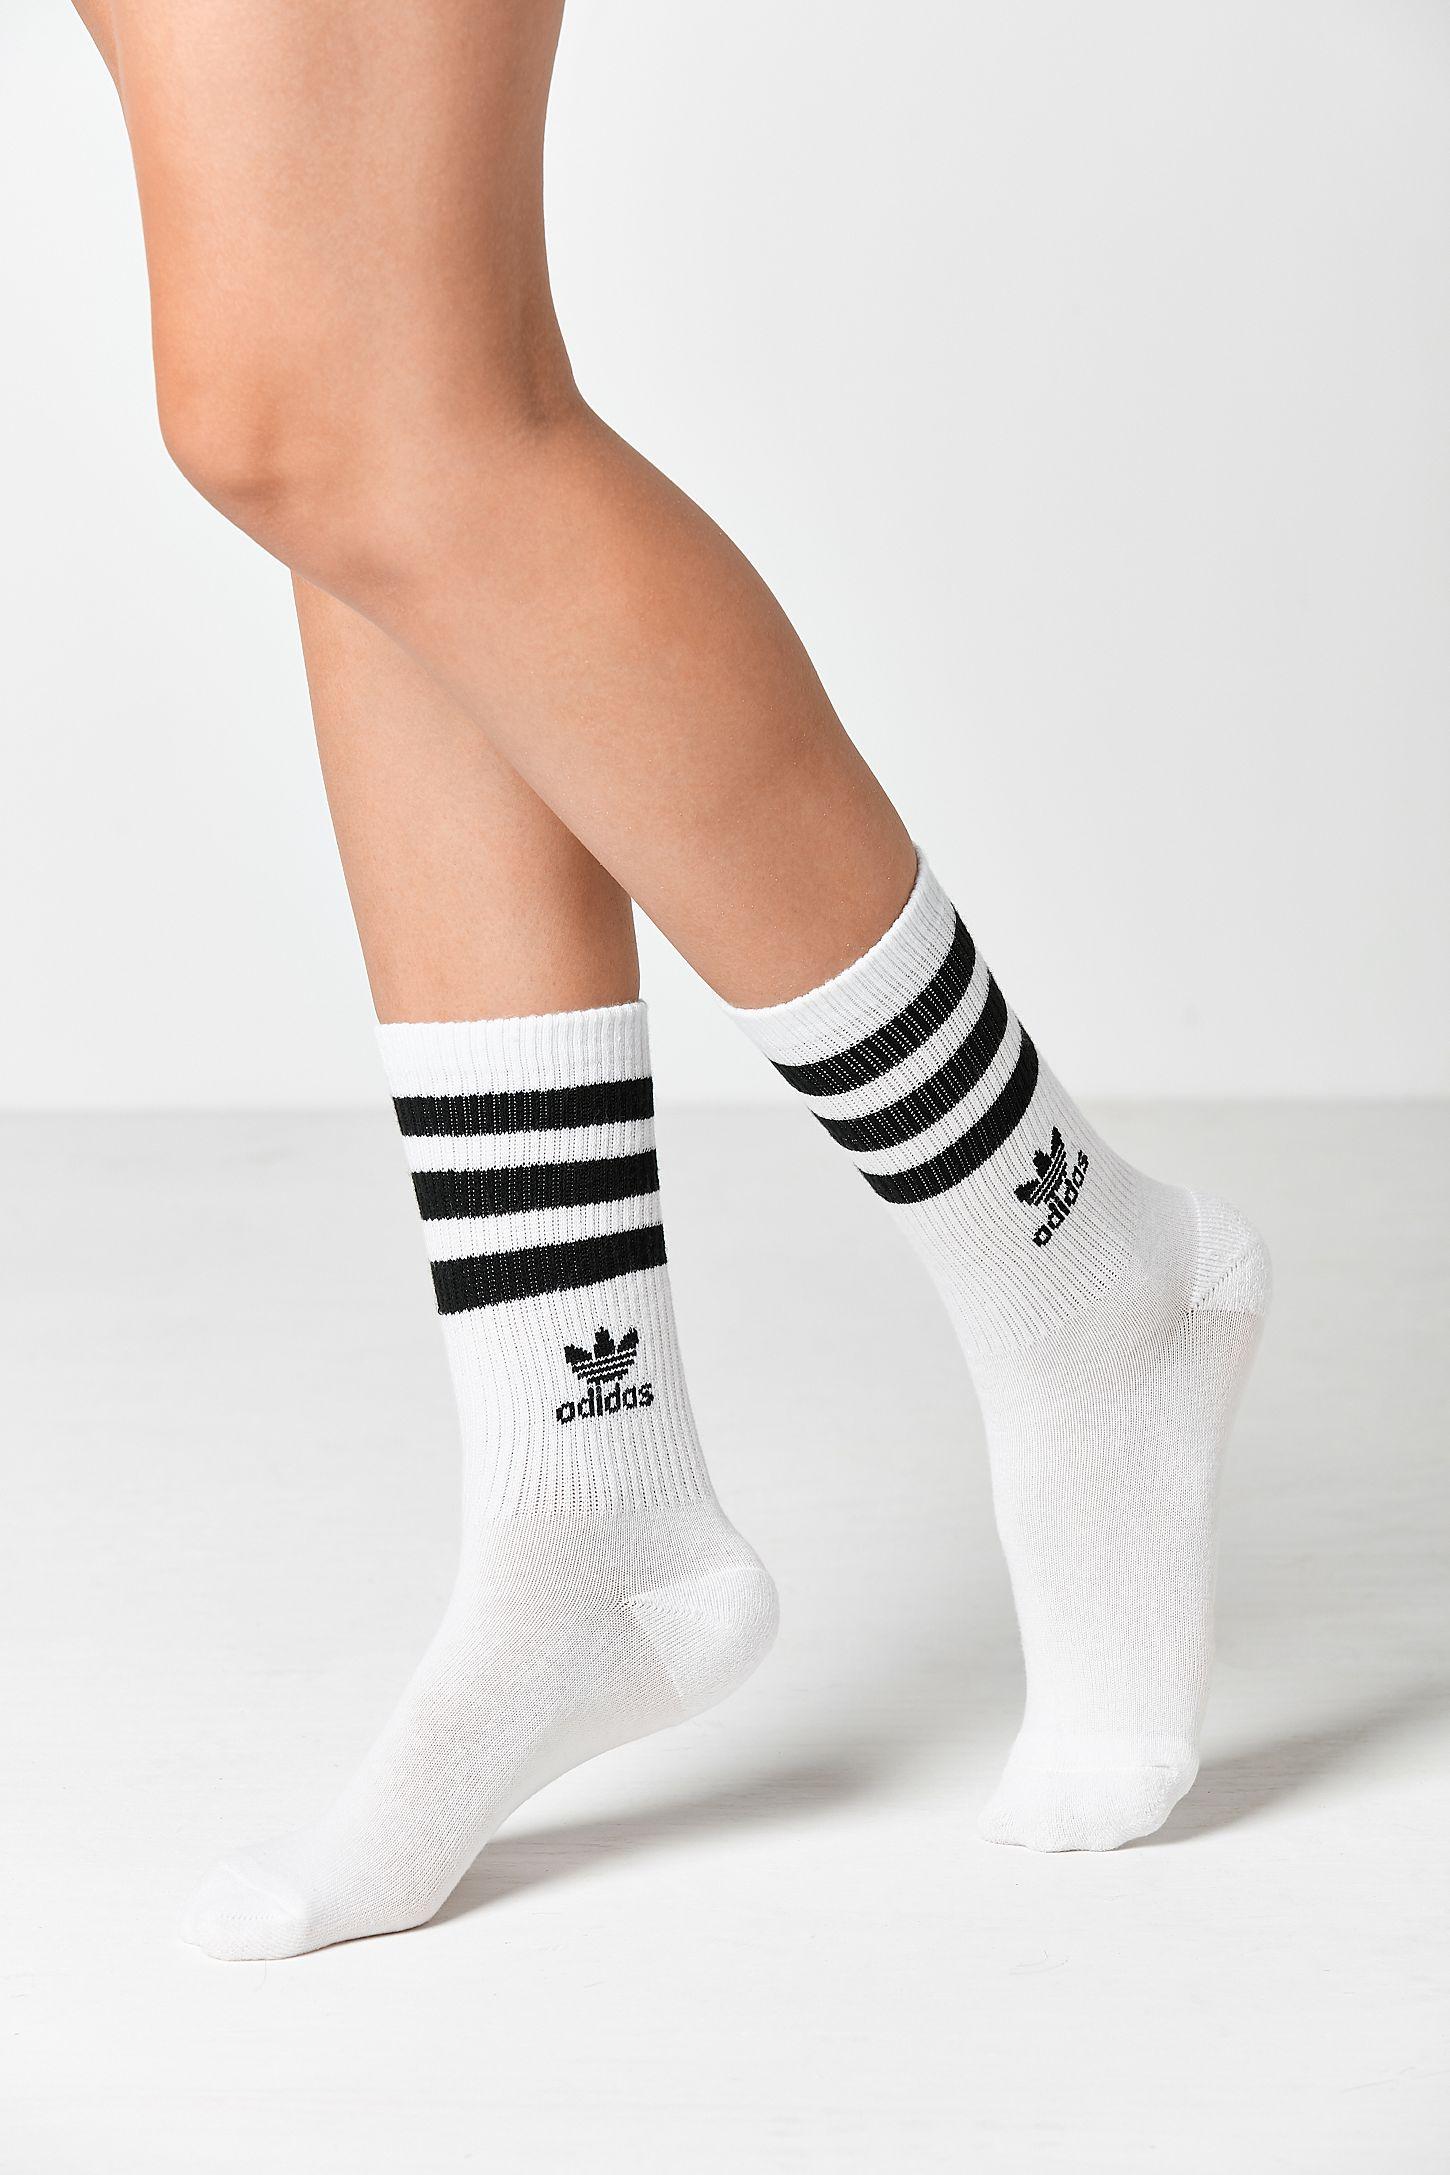 904c439d1 adidas Originals Single Roller Crew Sock | Urban Outfitters